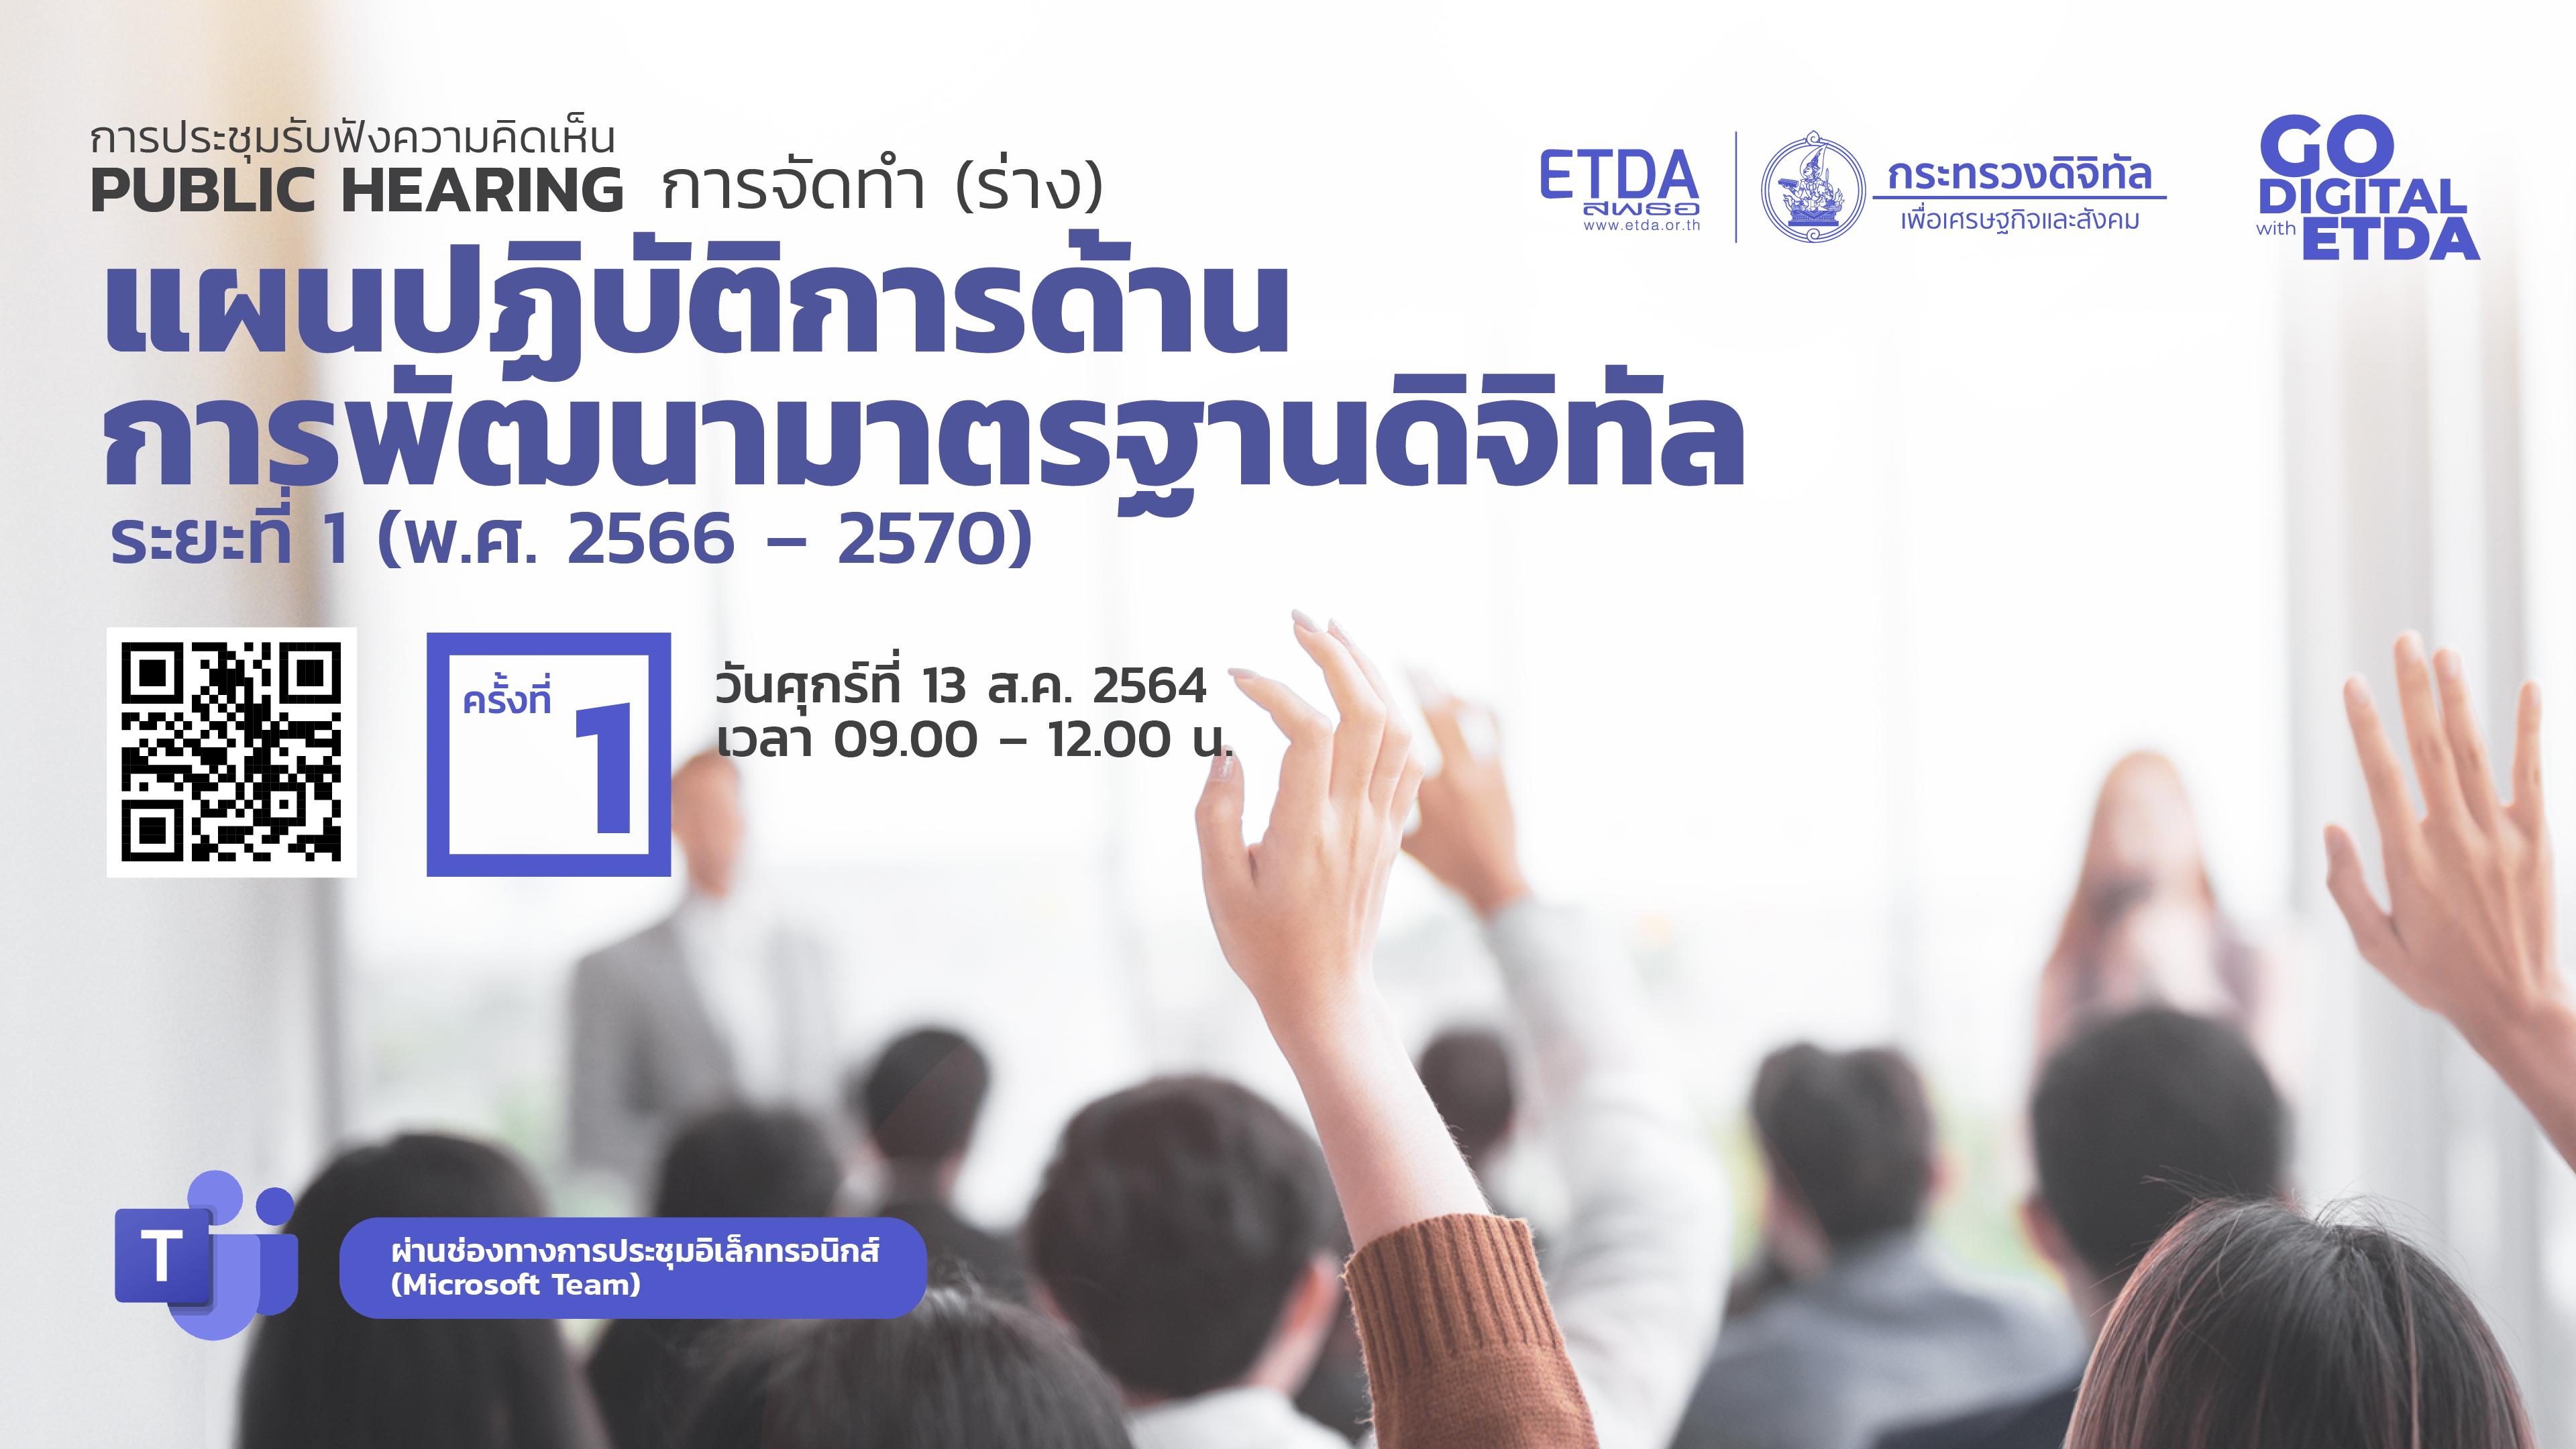 ETDA เดินหน้าผลักดัน Digital Standards Master Plan